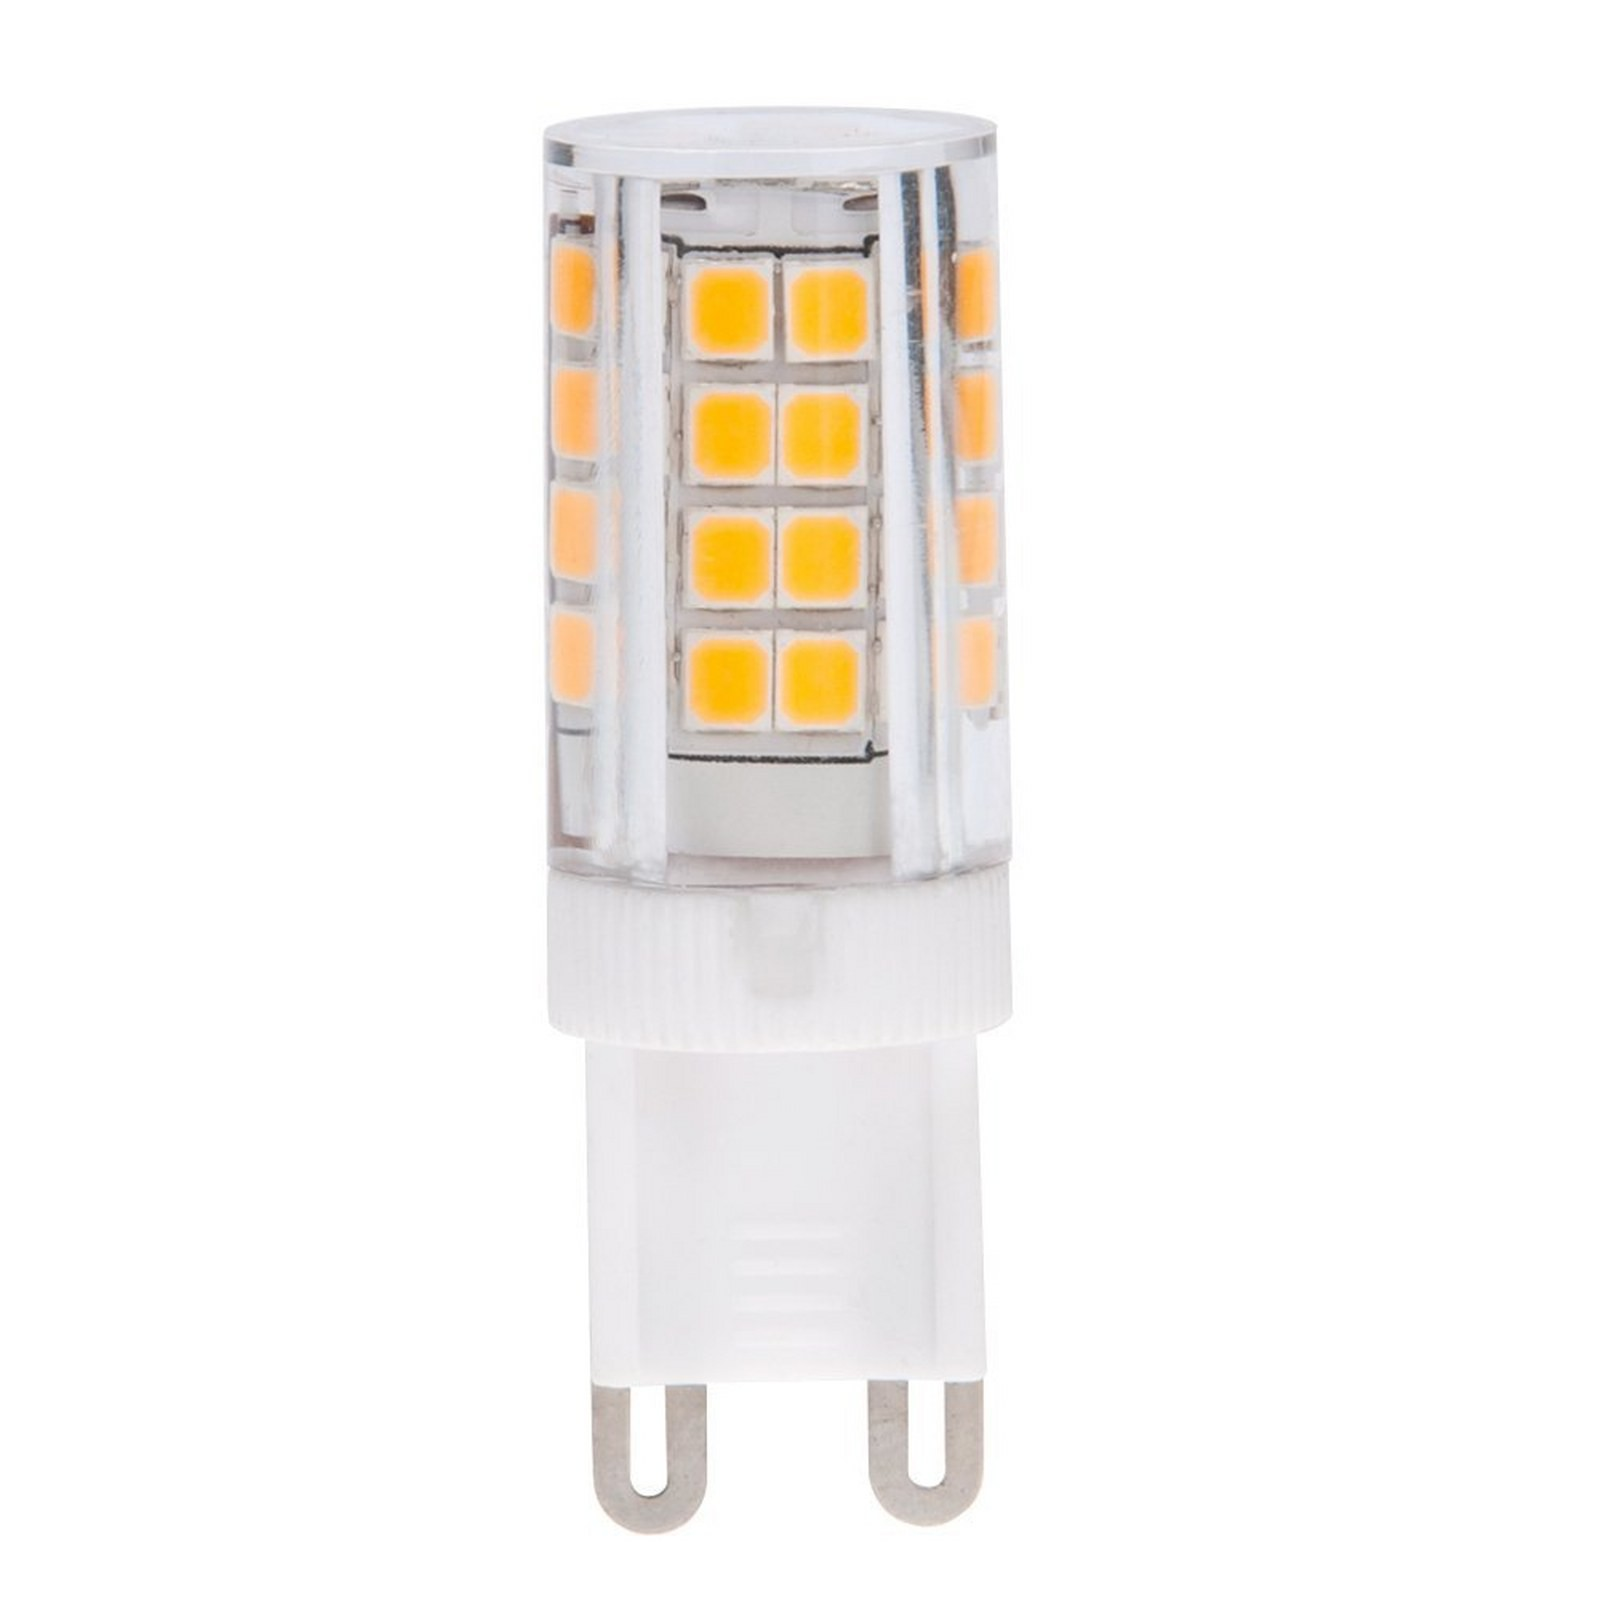 lampadina luce naturale : Home / Lampada Led Lampadina Attacco G9 Luce Naturale SMD LIFE 4 Watt ...